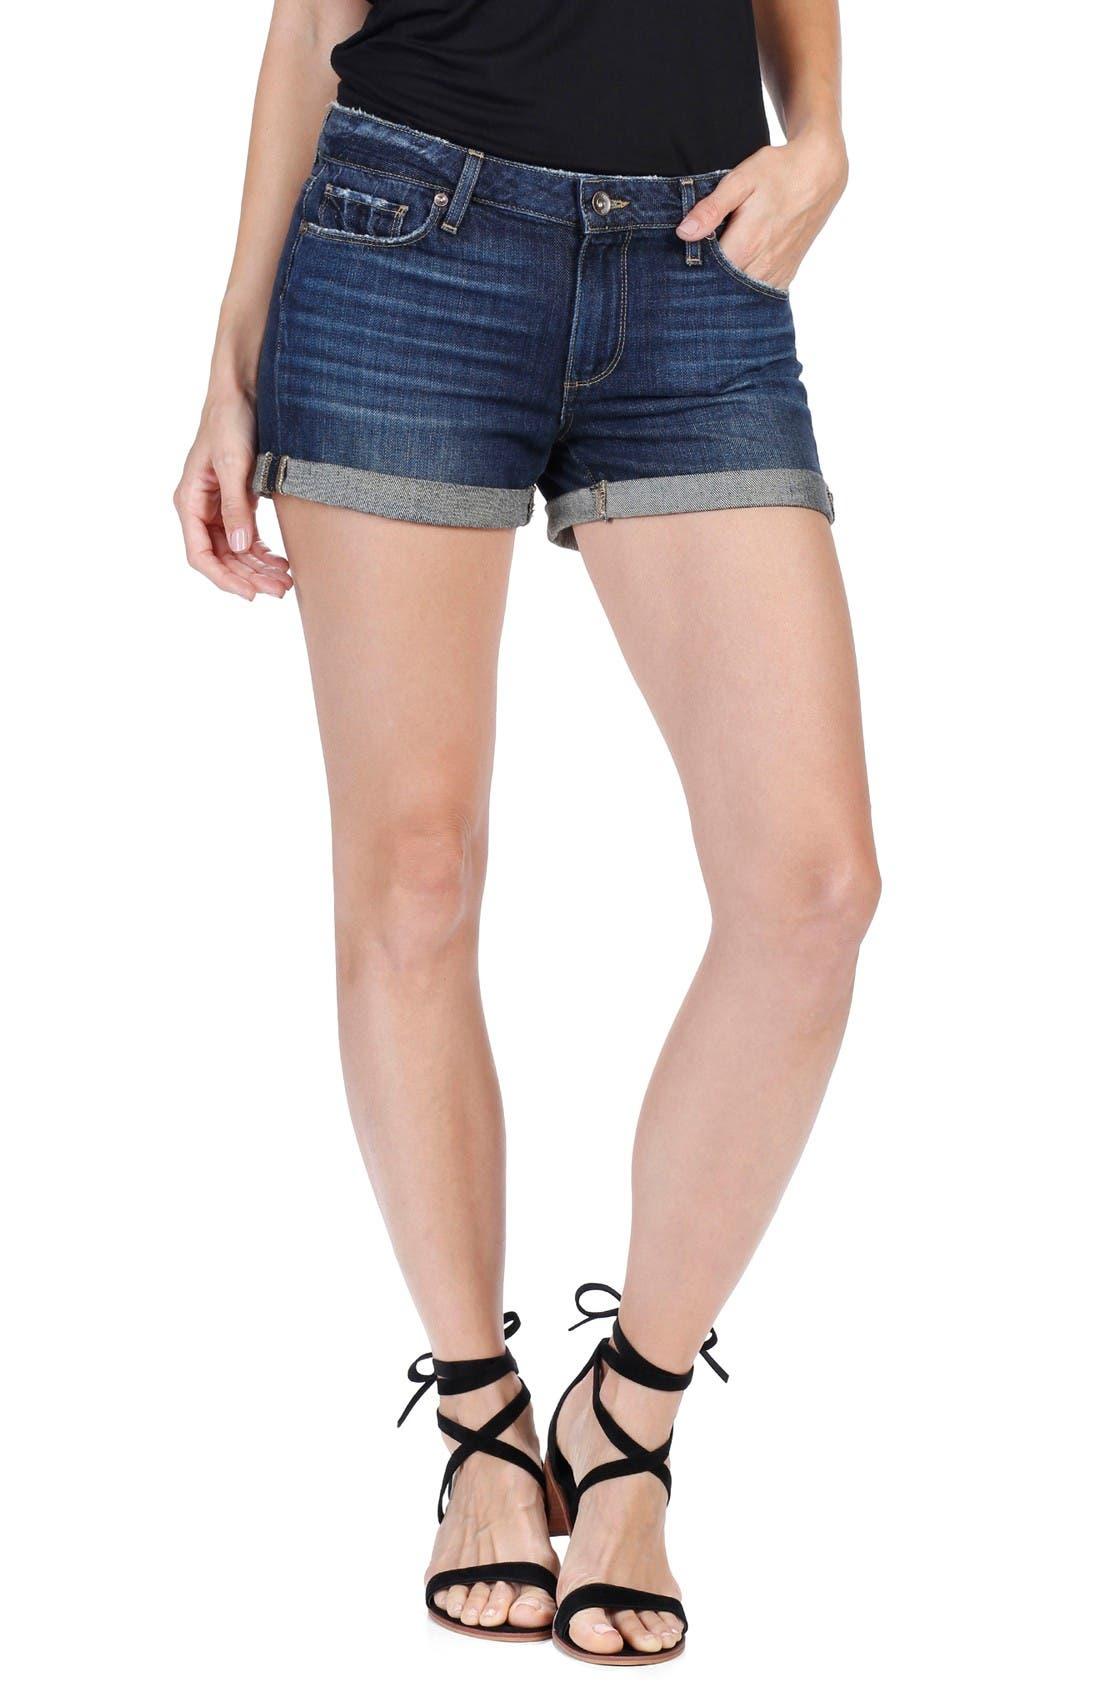 PAIGE Jimmy Jimmy Denim Shorts (Virginia)